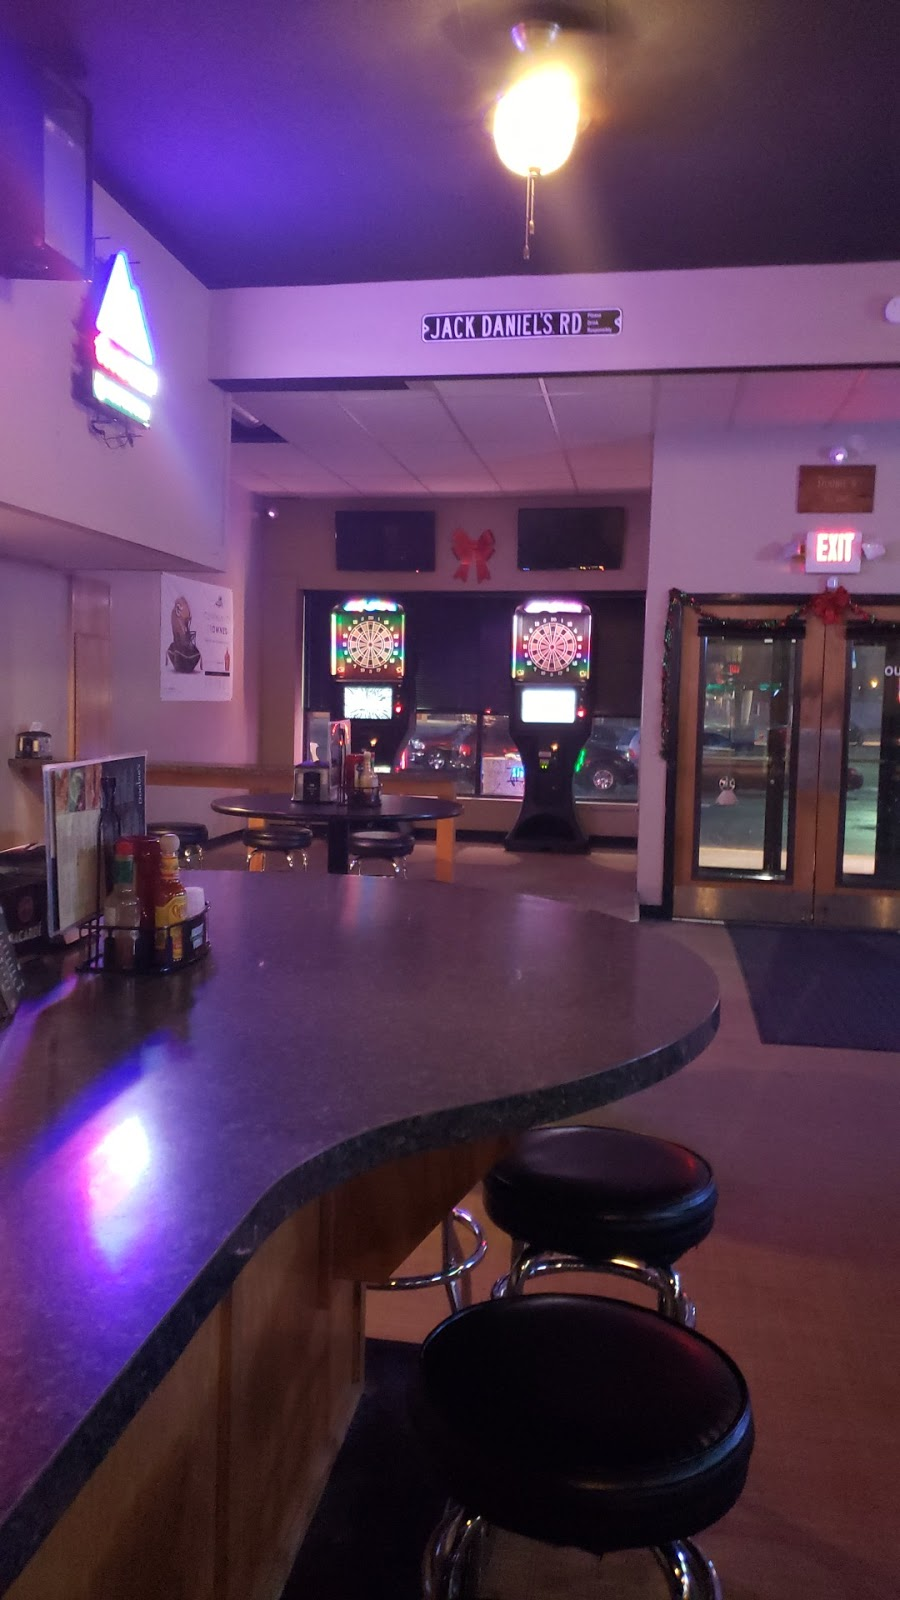 Doobies Beer Joint | restaurant | 3701 Durand Ave, Racine, WI 53405, USA | 2628003343 OR +1 262-800-3343